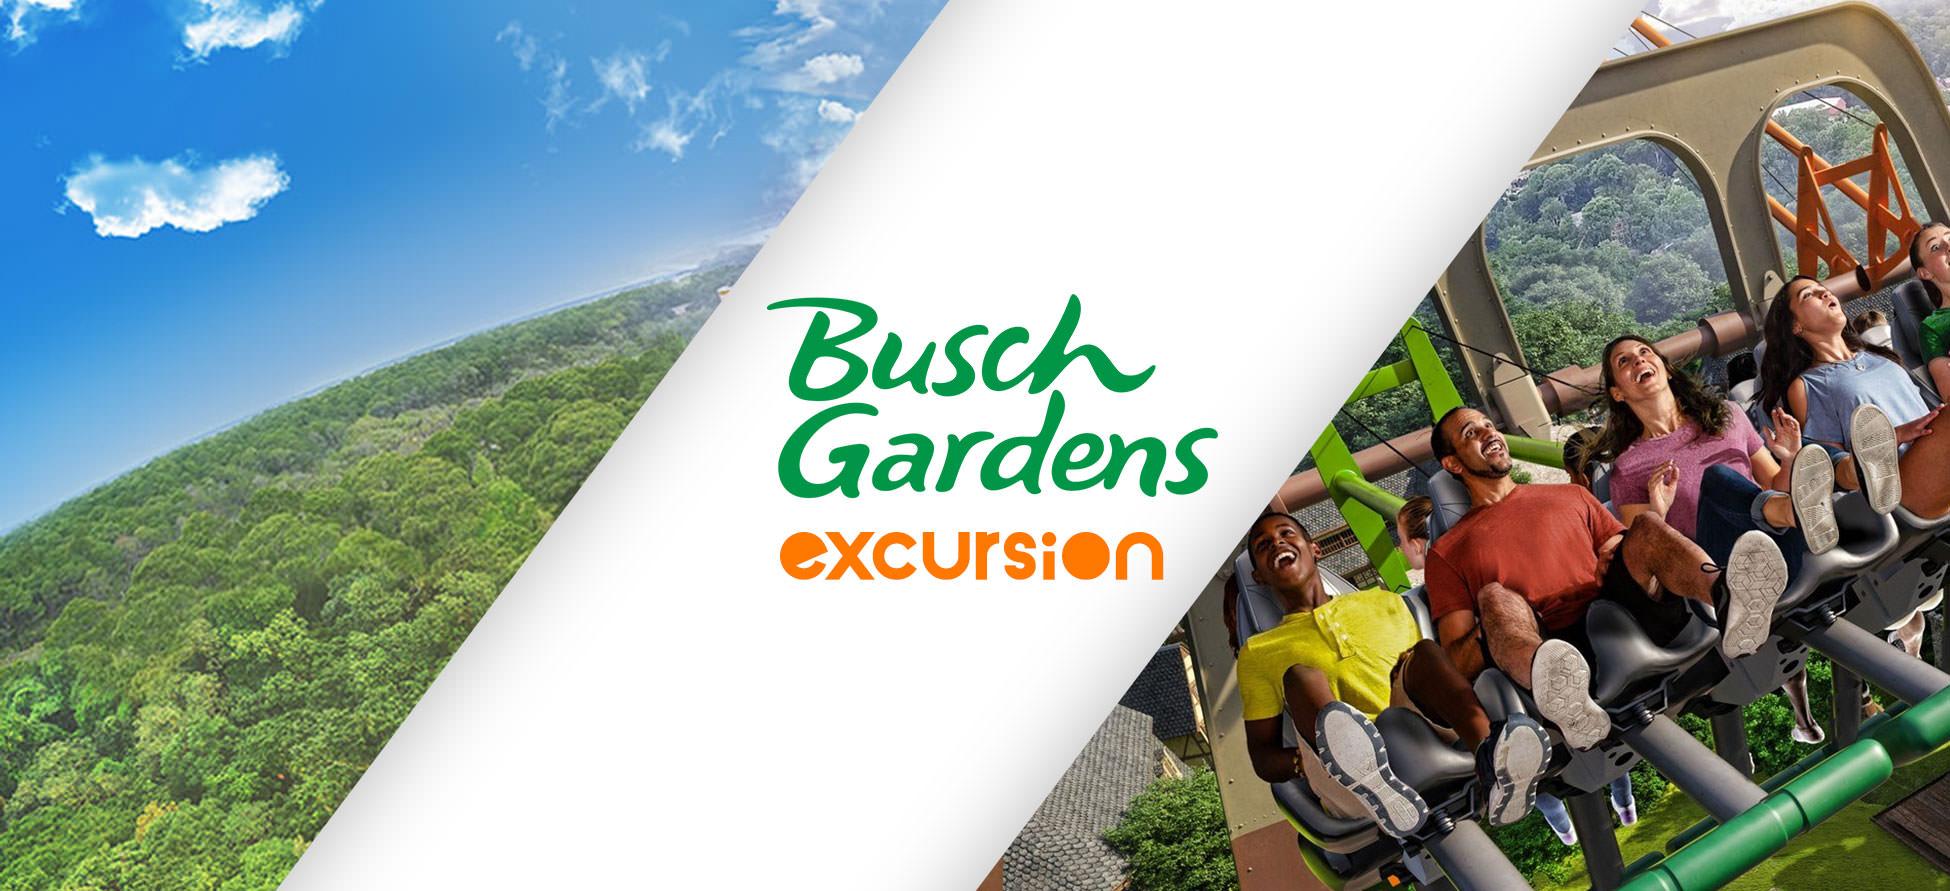 Website_1950x891px_BushGardens